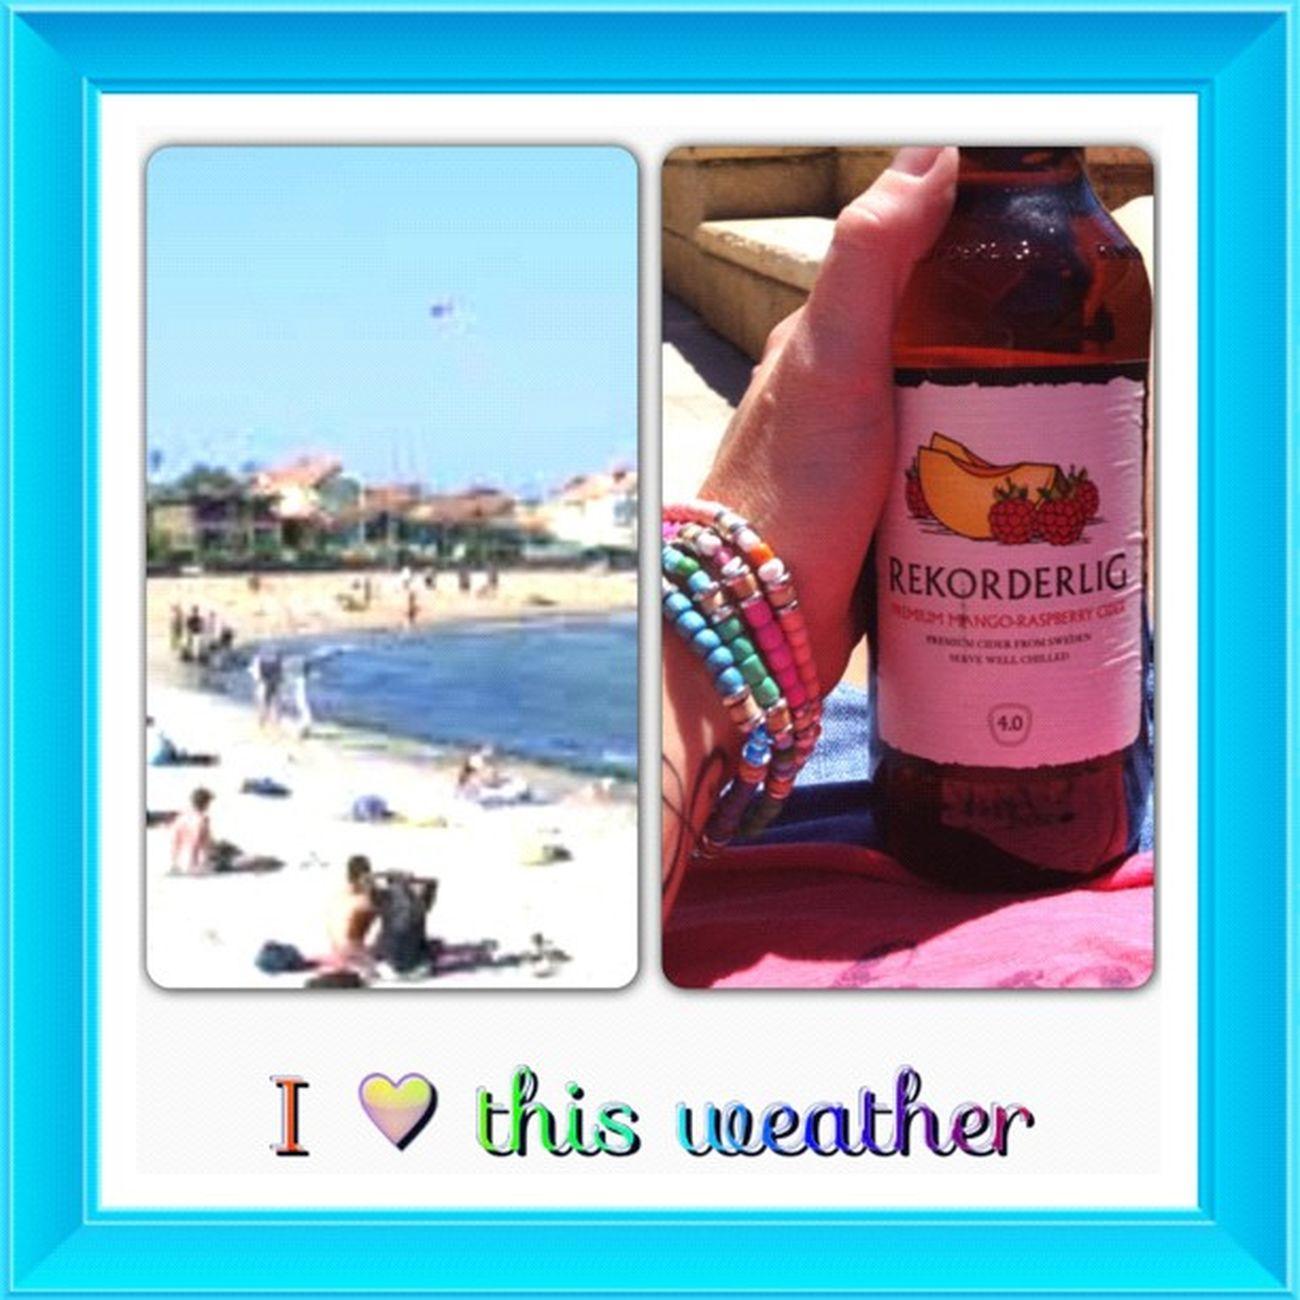 Loving this gorgeous day ? Sun Beach Rekorderlig LovingLife tan cant waitforsummer InstaFrame @InstaframeApp